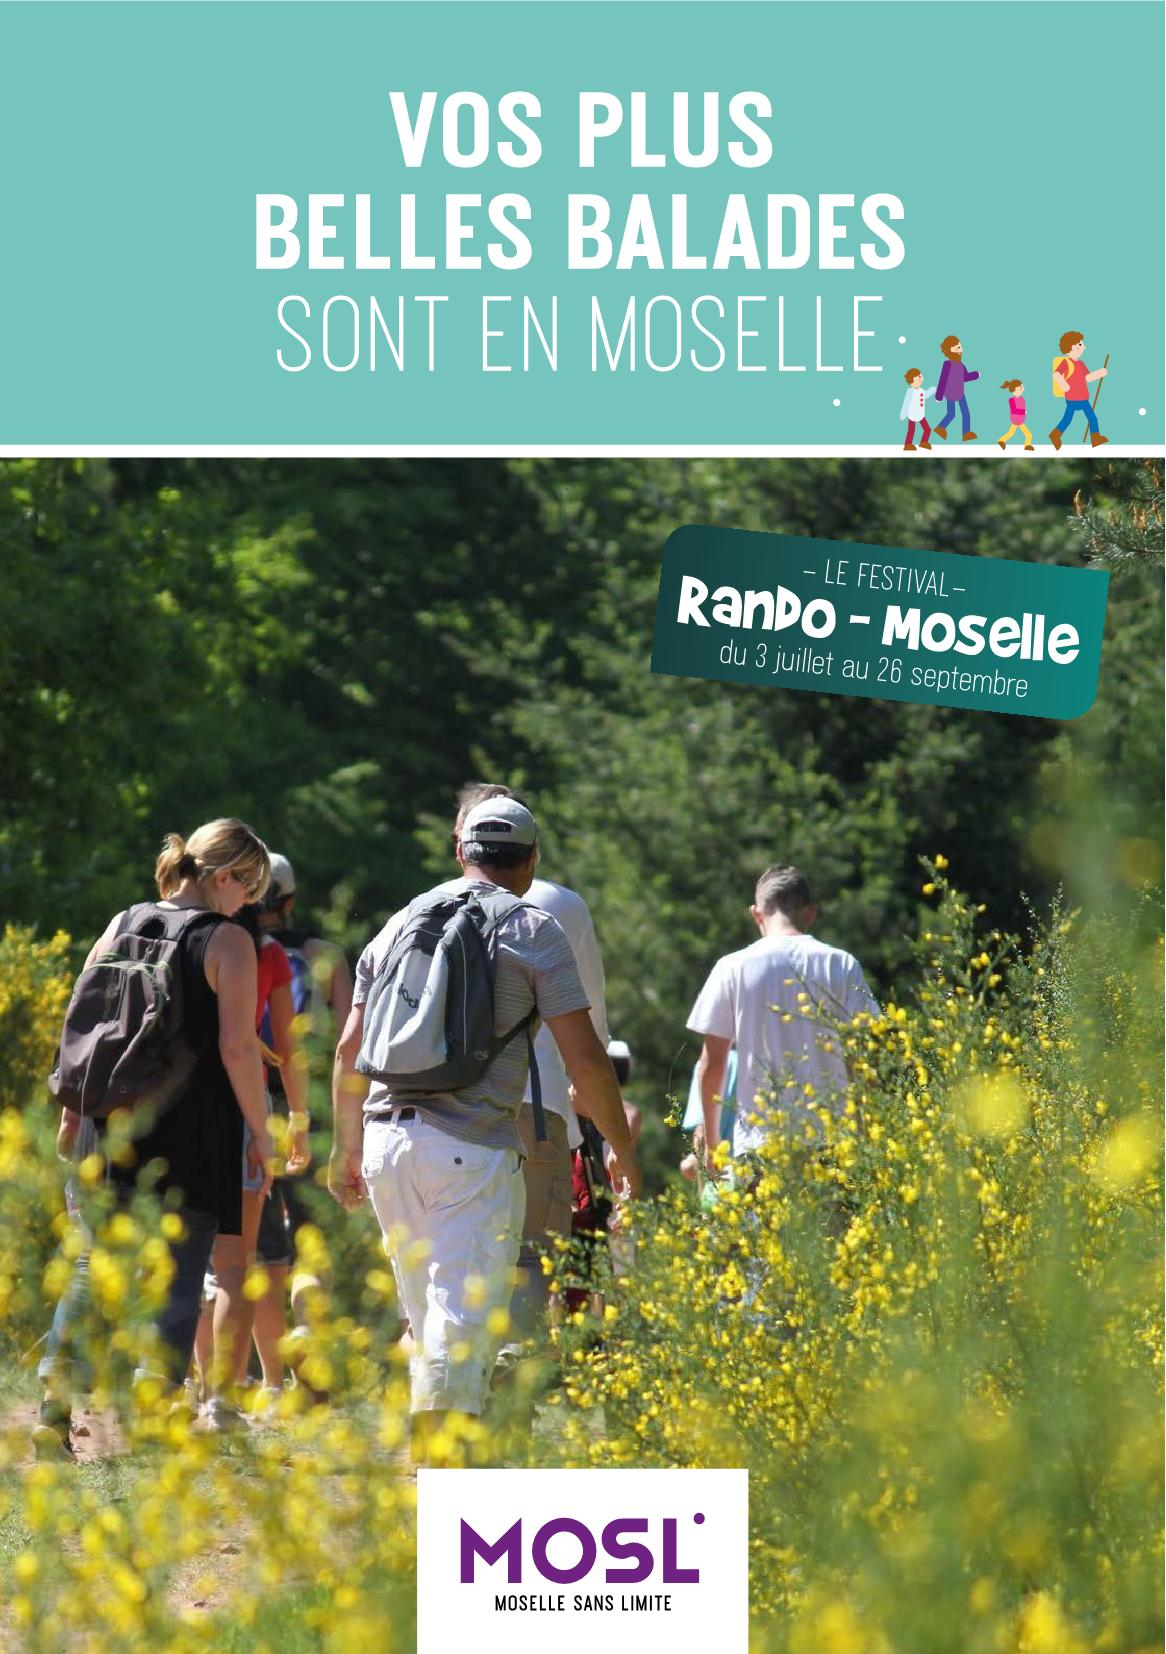 Rando-Moselle Le Festival des Randonnées 2021